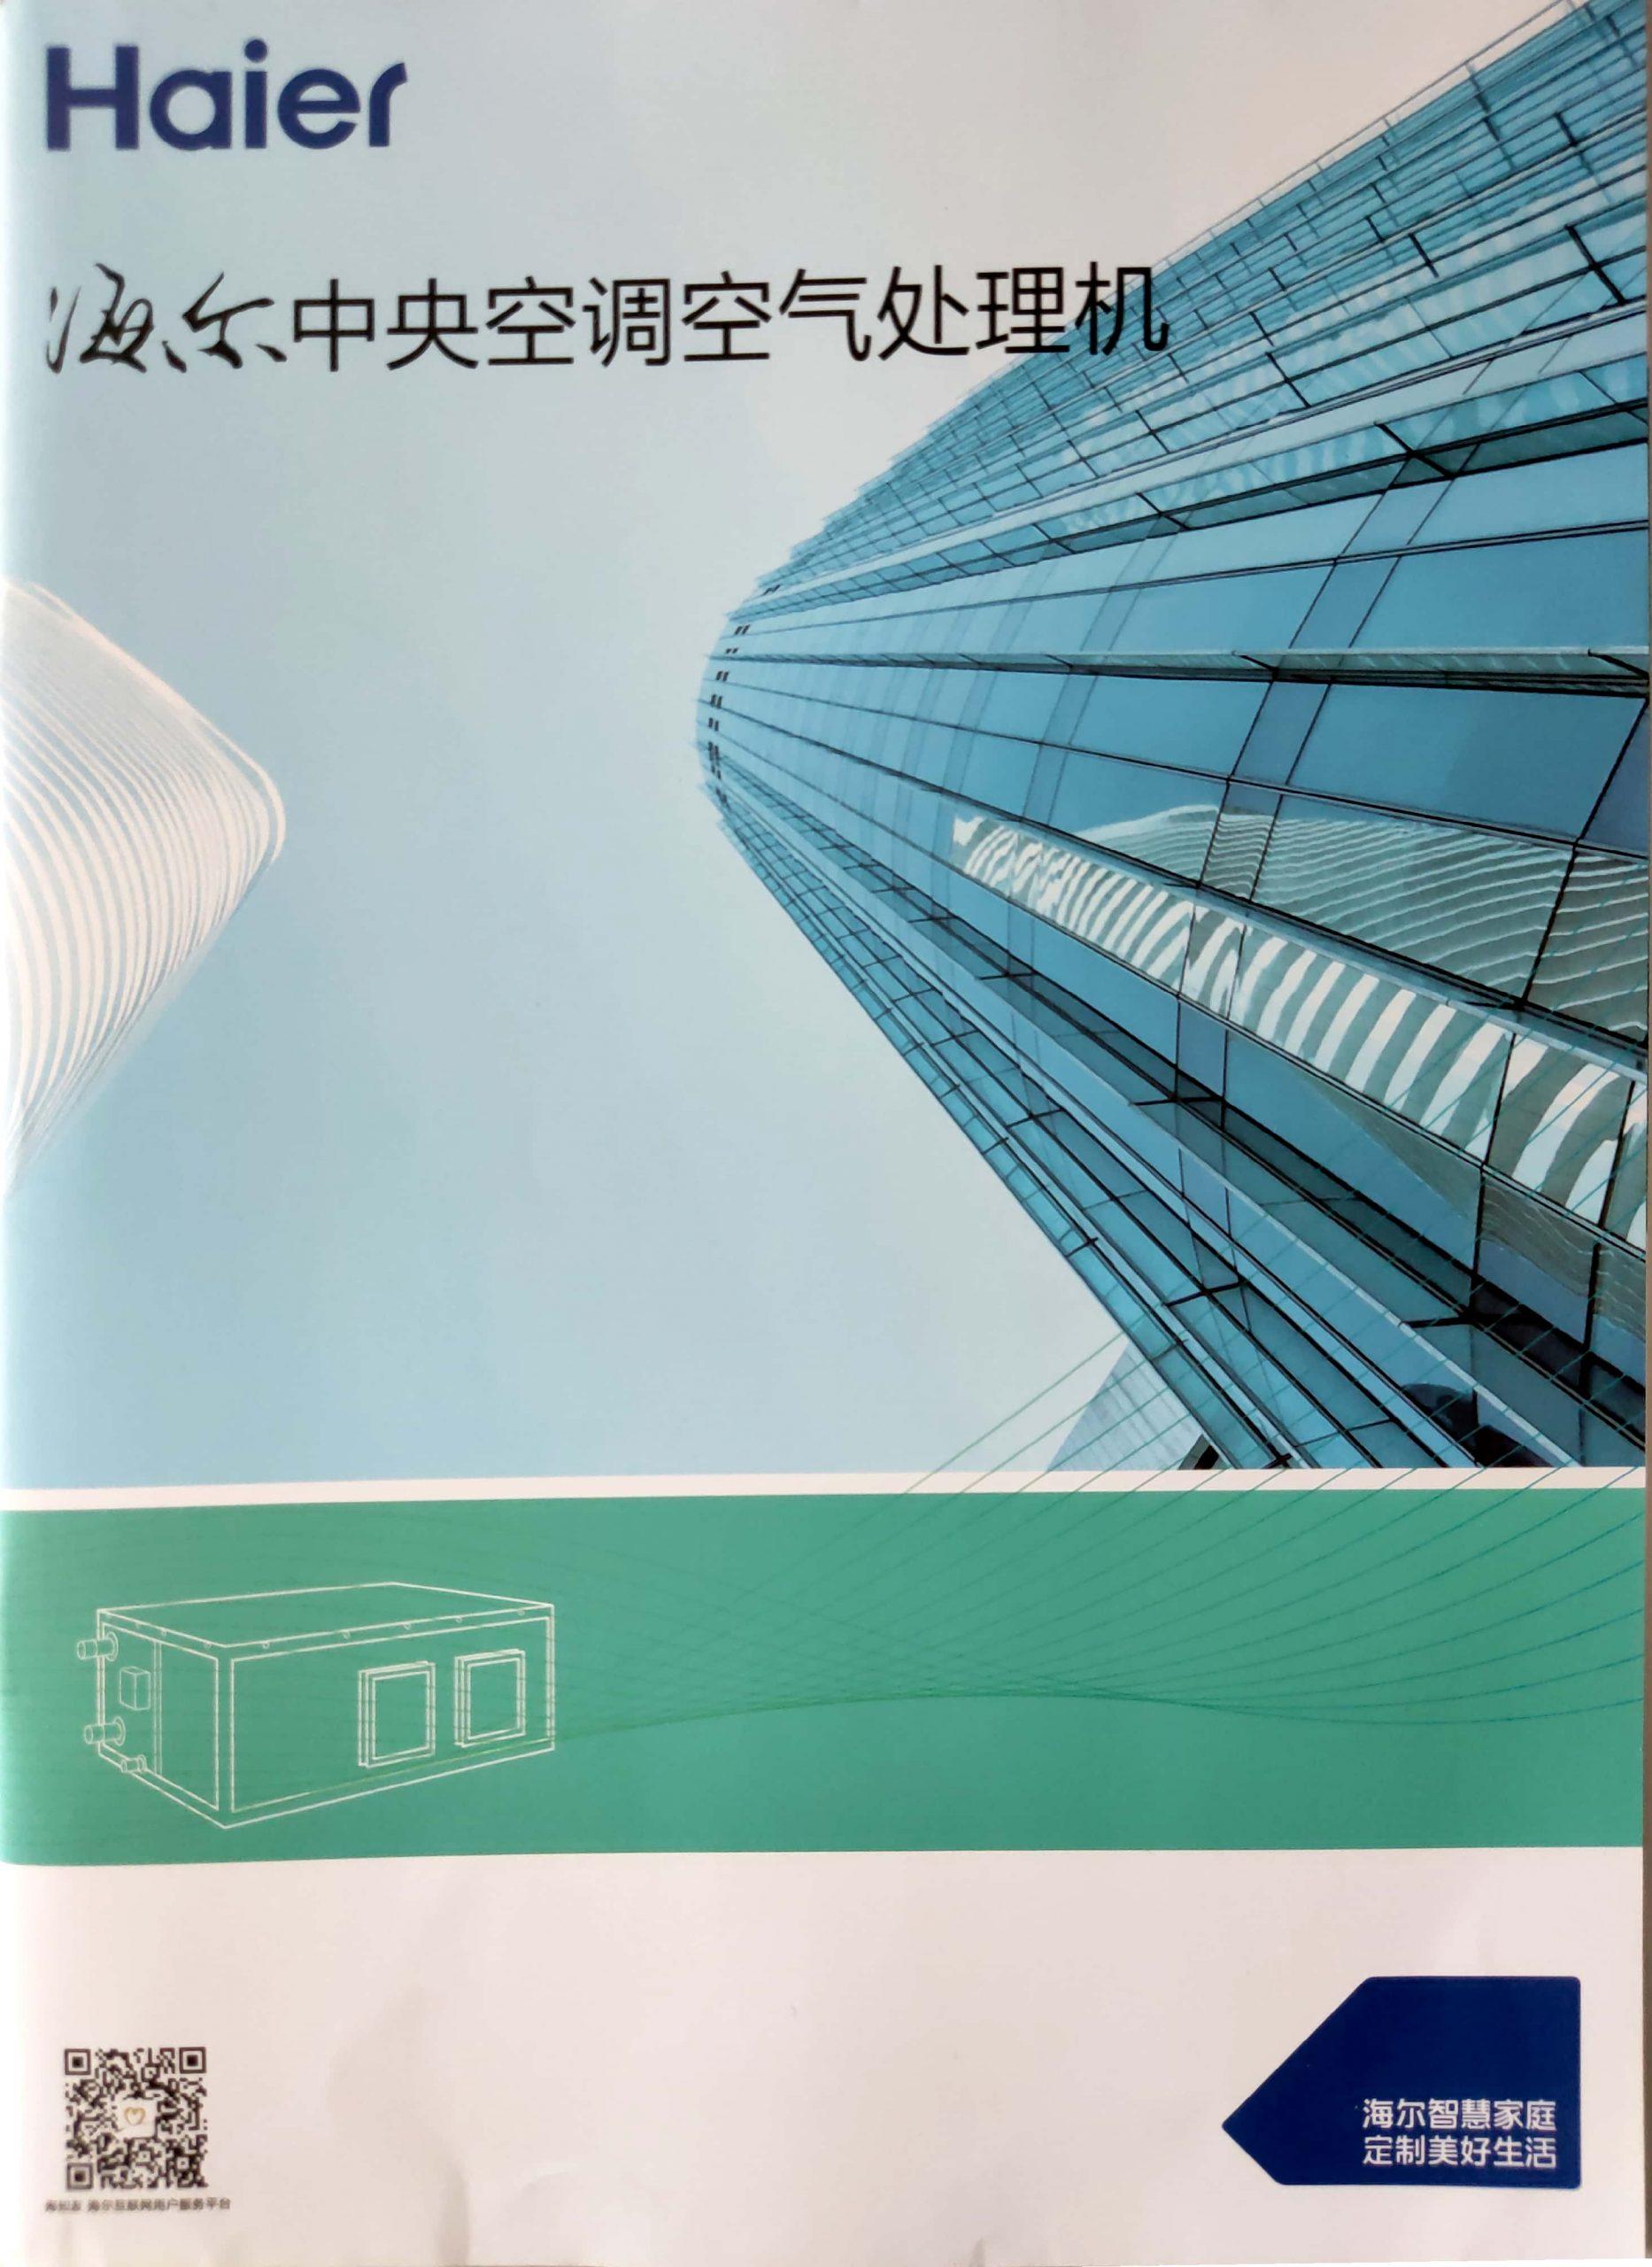 Haier海尔中央空调空气处理机样册下载